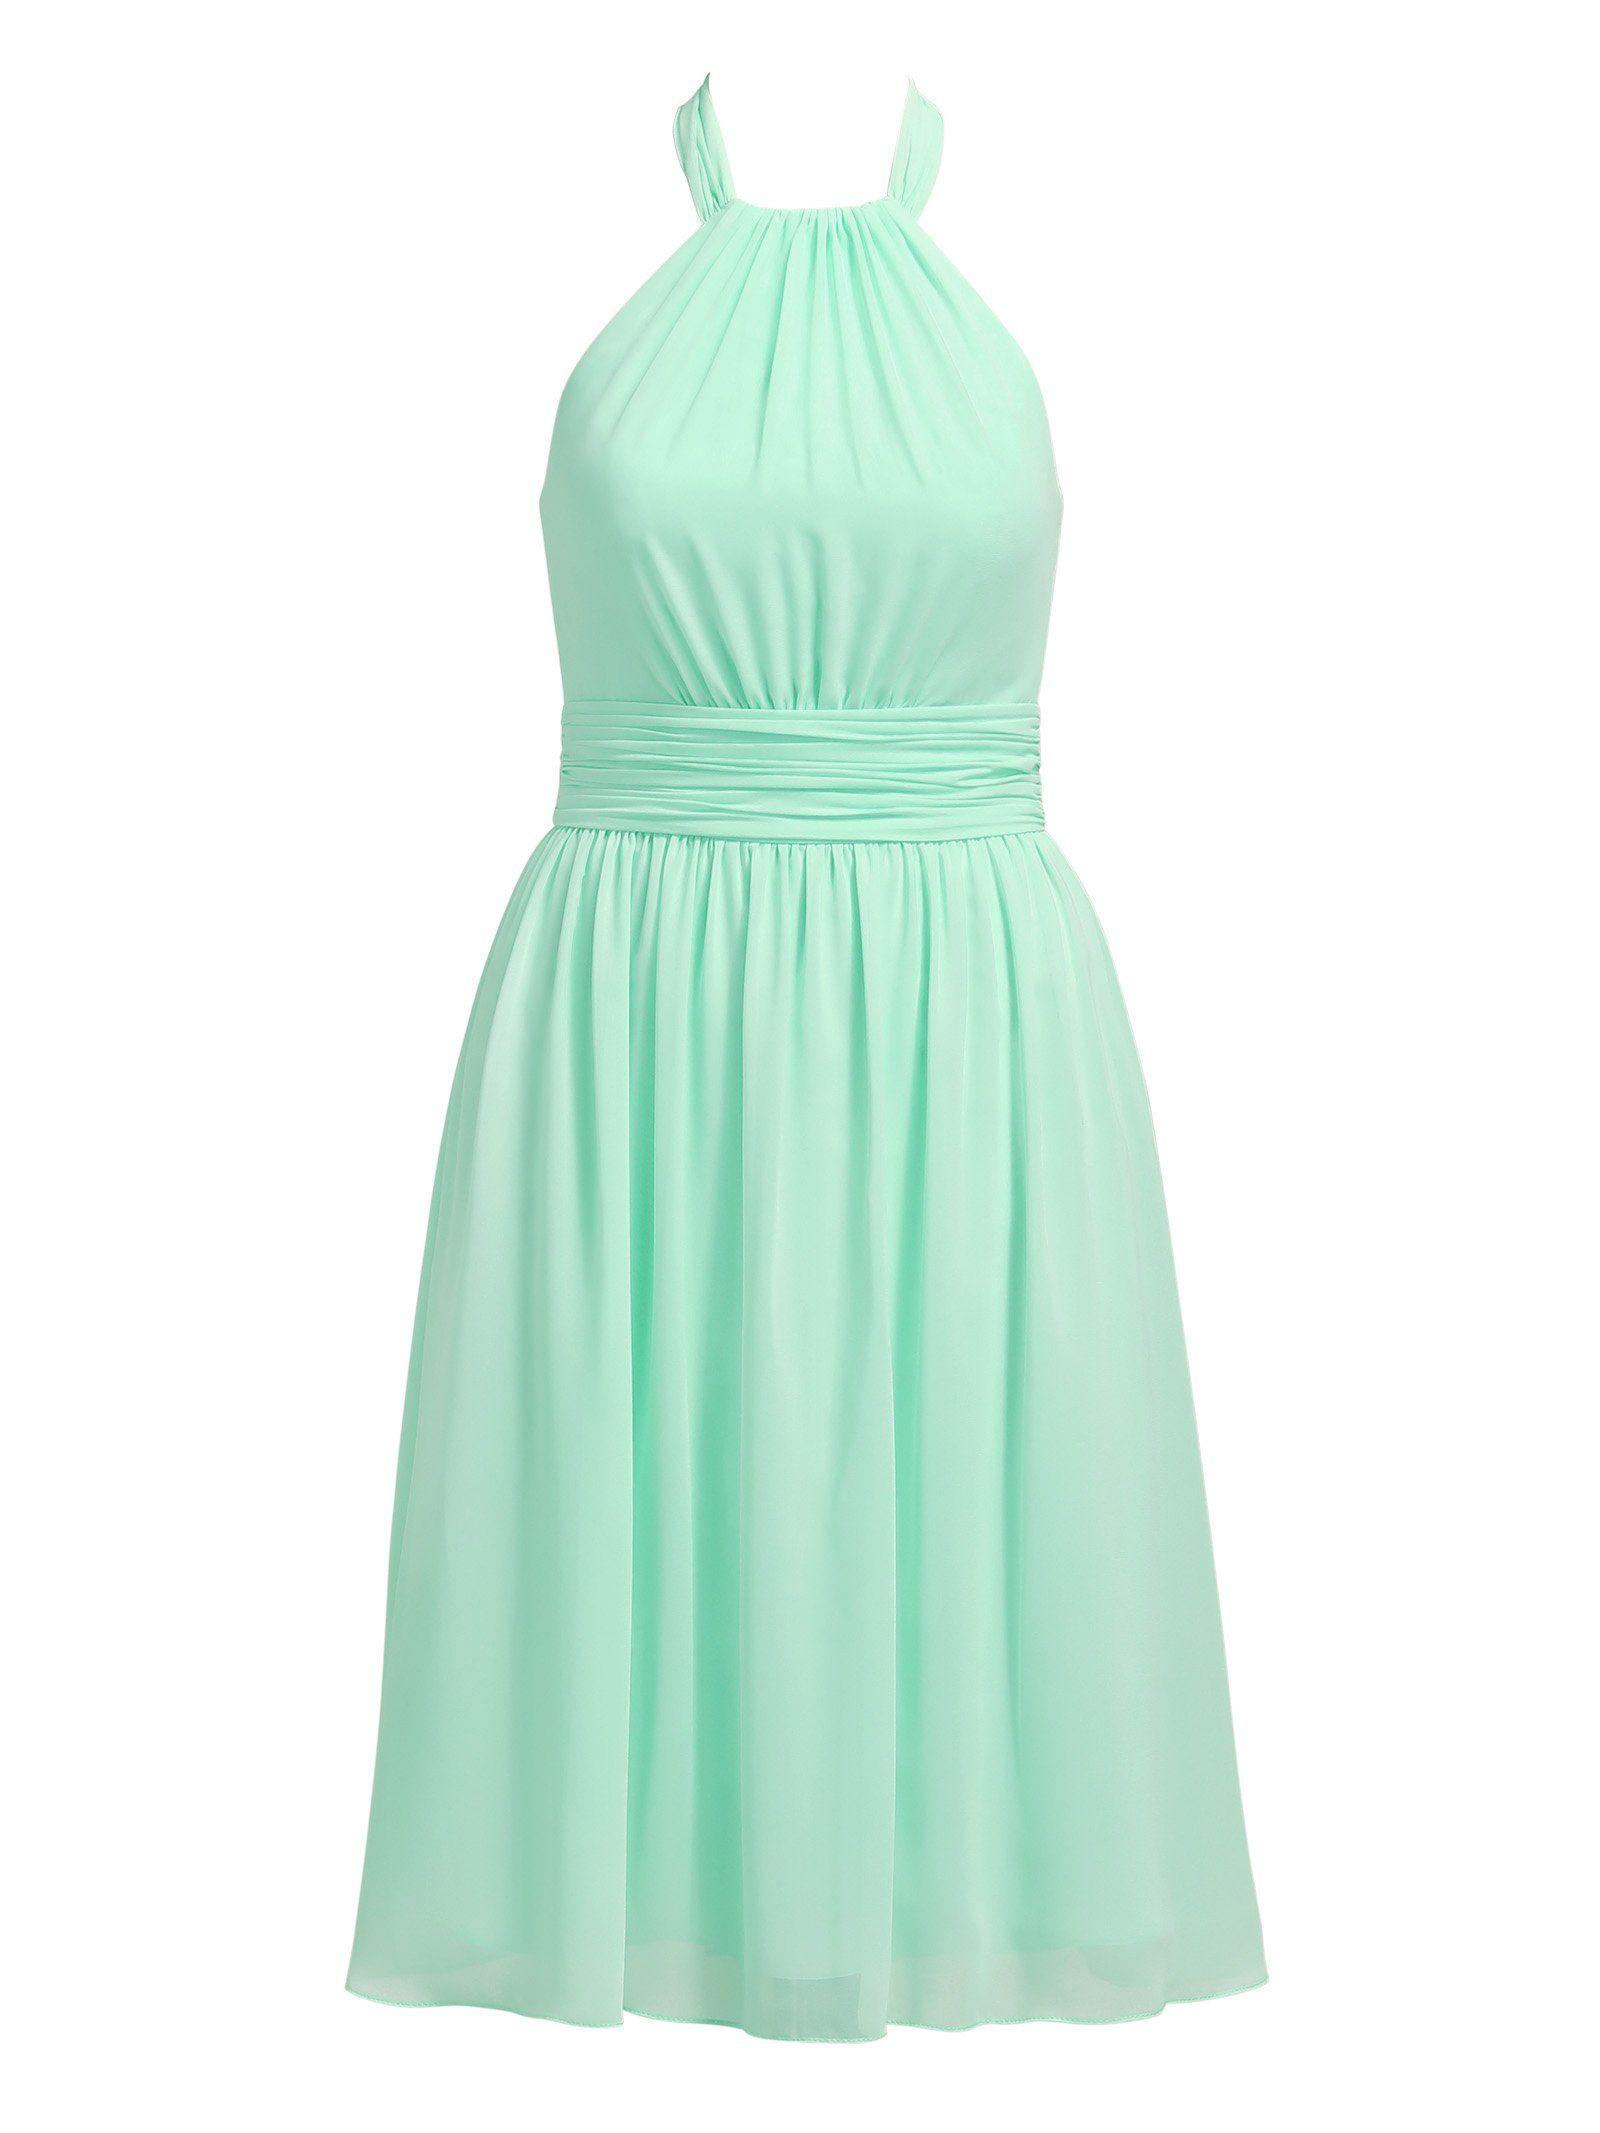 dbd3ebbf804 Alicepub Chiffon Bridesmaid Dresses Short Halter Evening Party Cocktail  Dress Knee Length Sleeveless Plus Size Mint